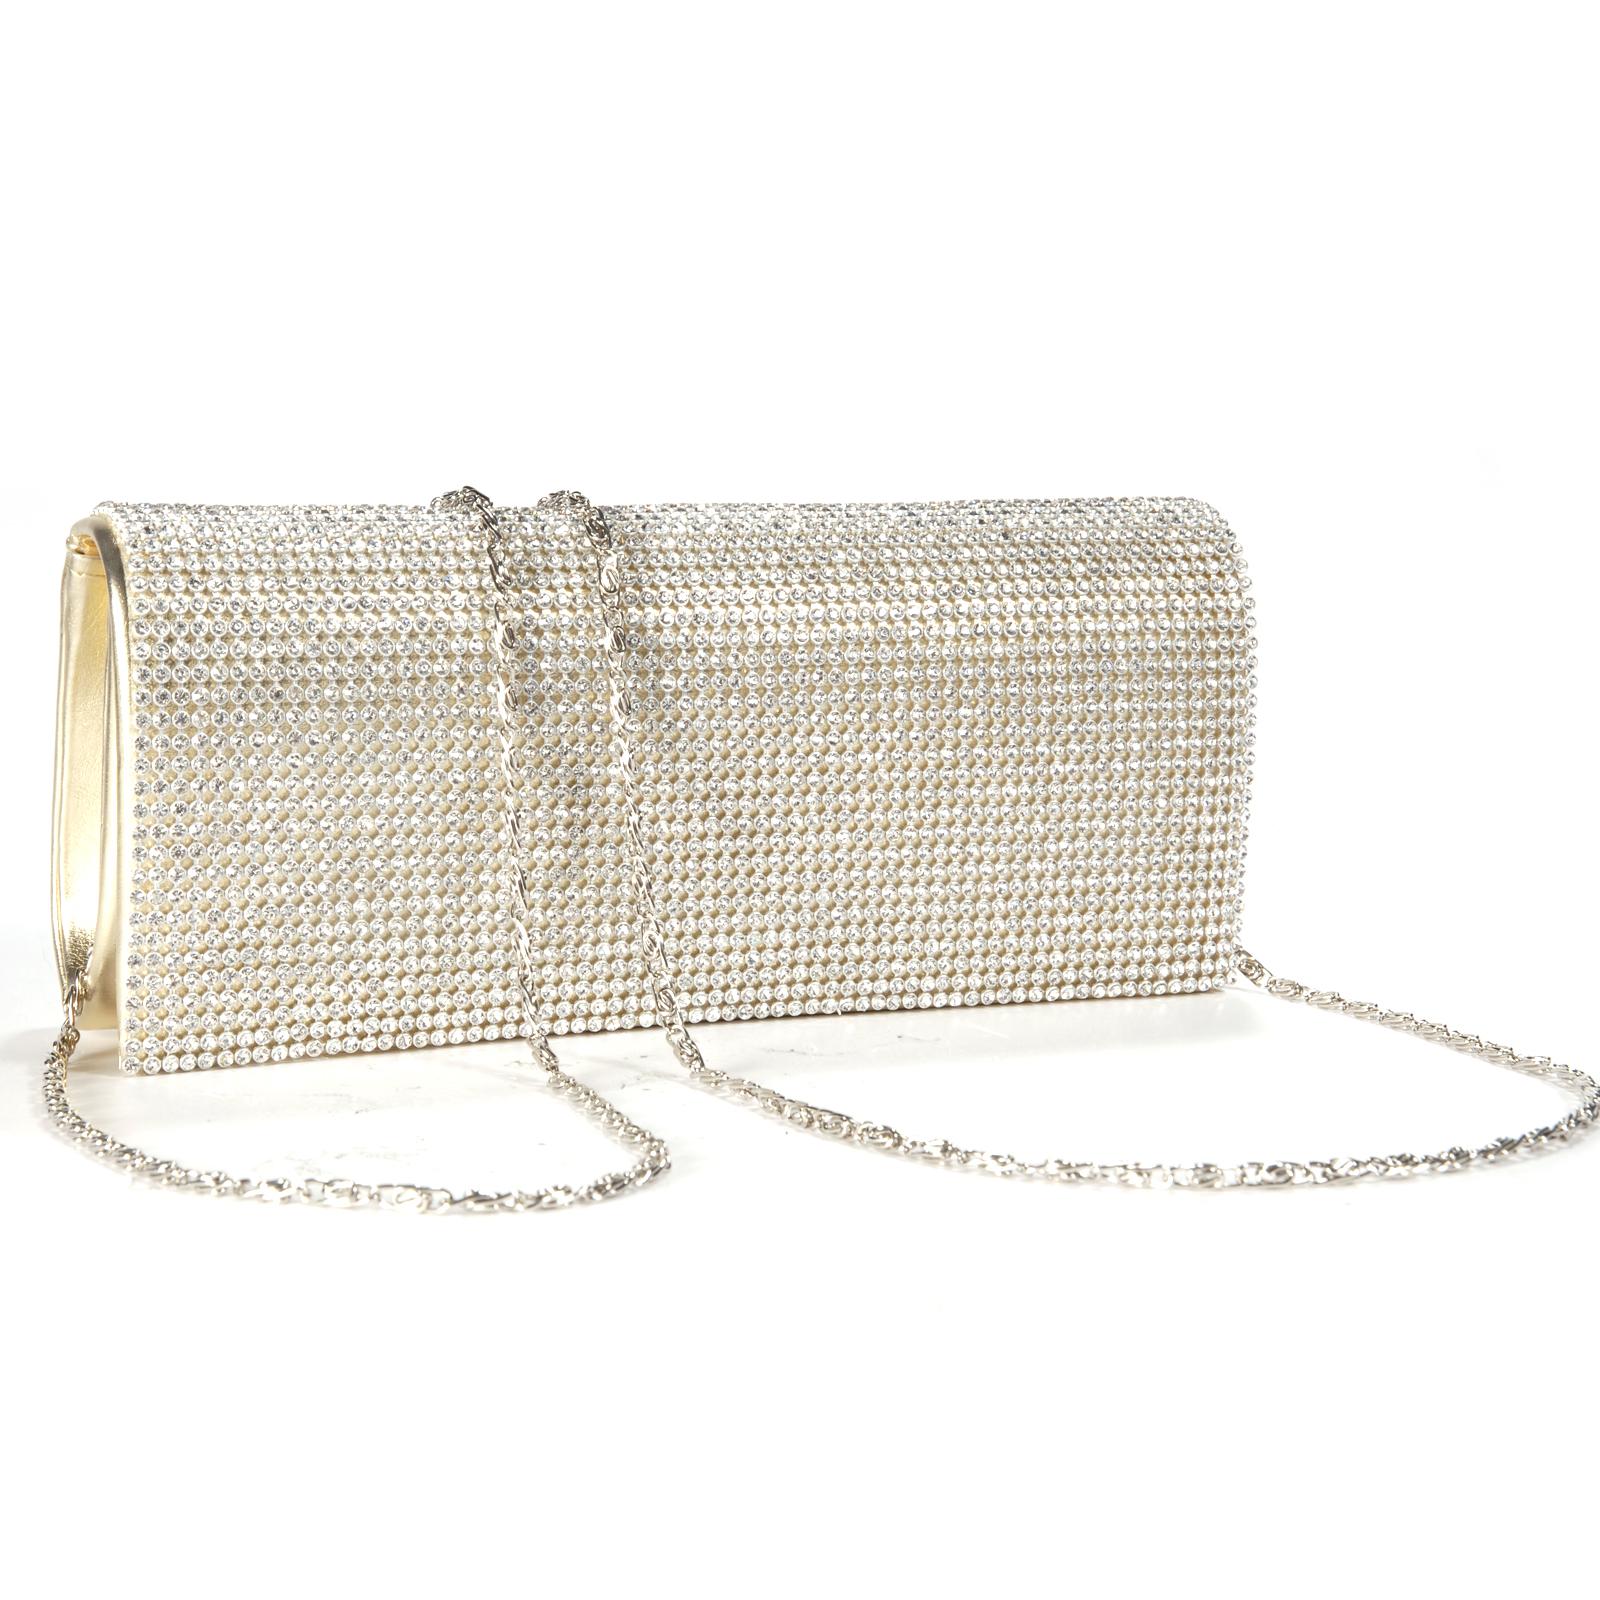 Details about Shimmering Gold Diamante Evening Bag Clutch Purse Wedding  Party Handbag 5feb108489f19